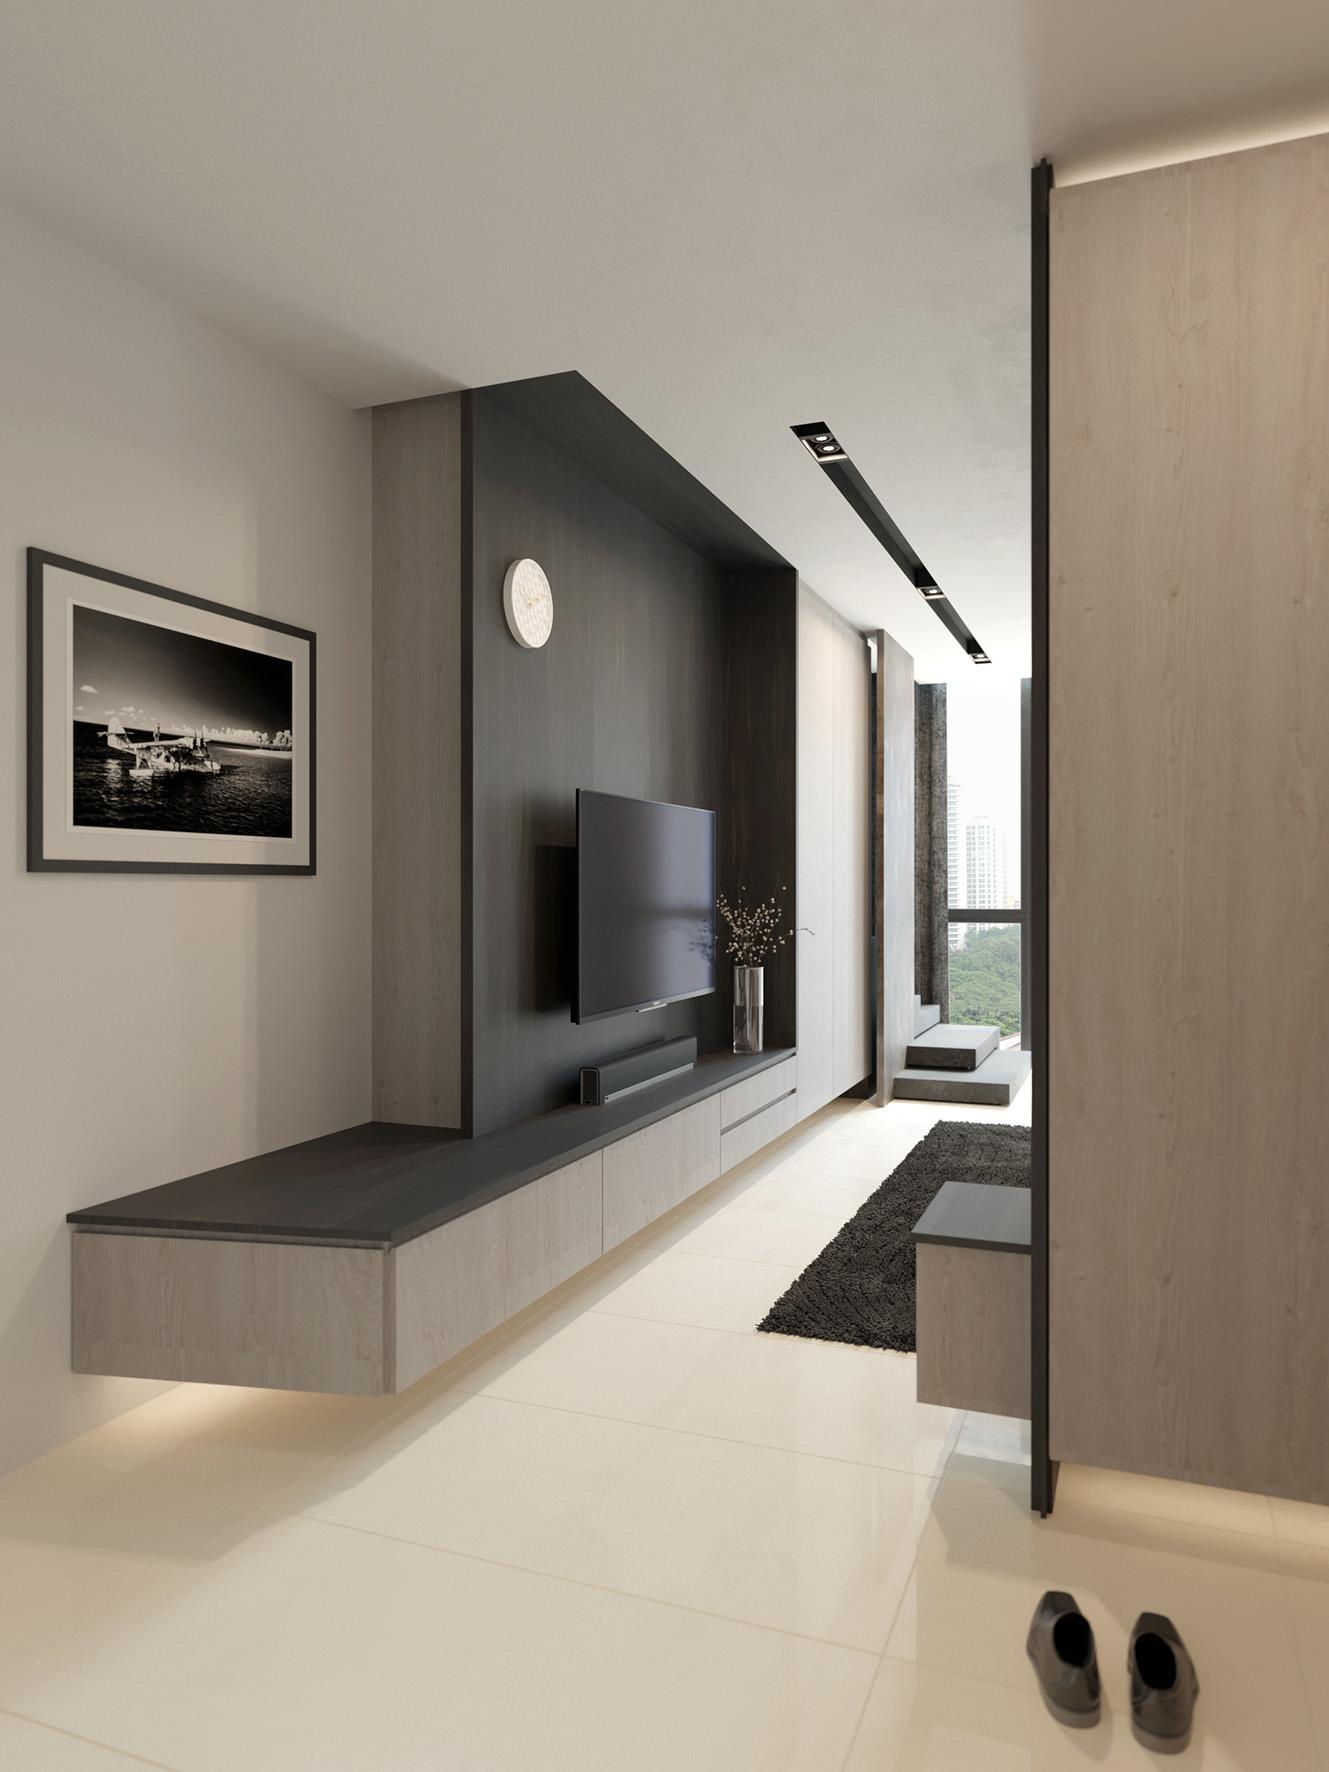 01 Foyer to Living